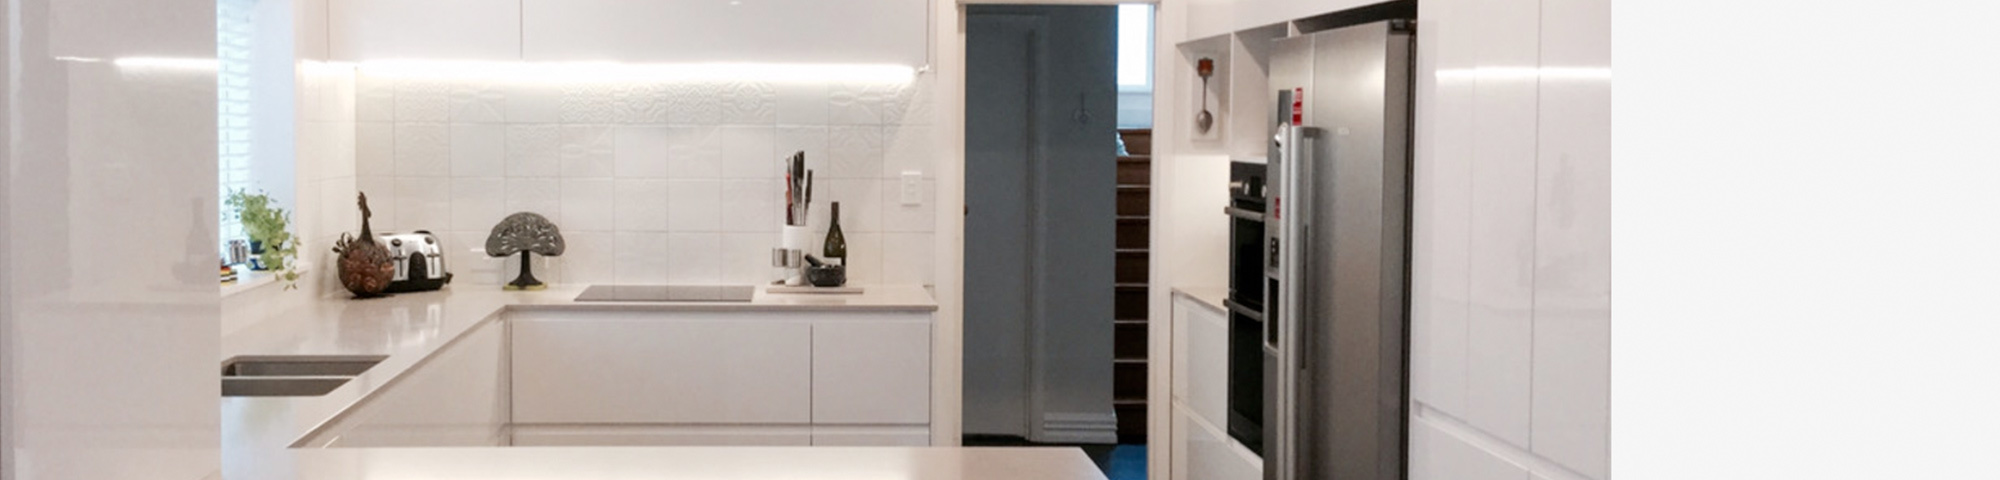 Bespoke kitchens wellington kitchen ideas hutt valley for Bathroom design wellington